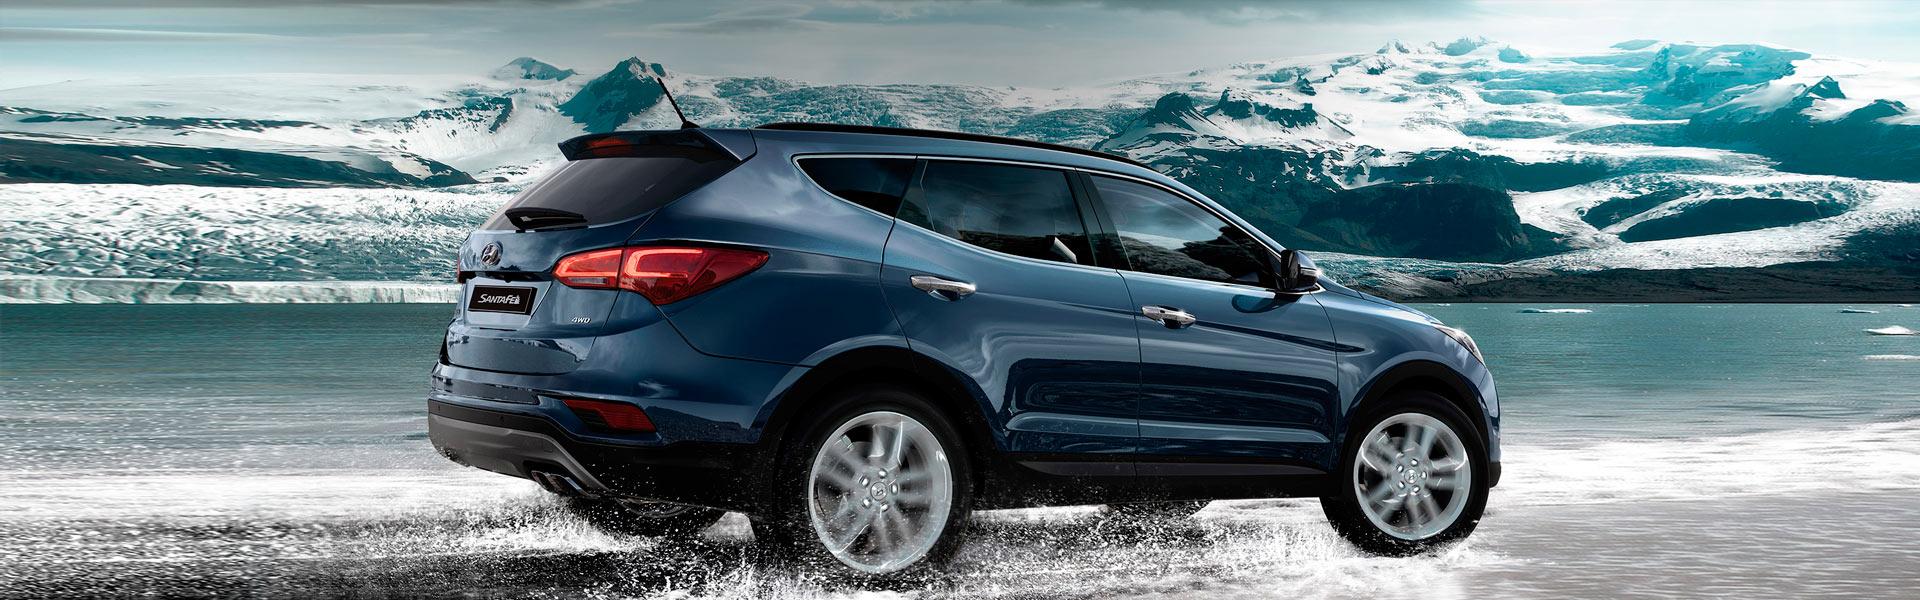 Запчасти на Hyundai Sonata